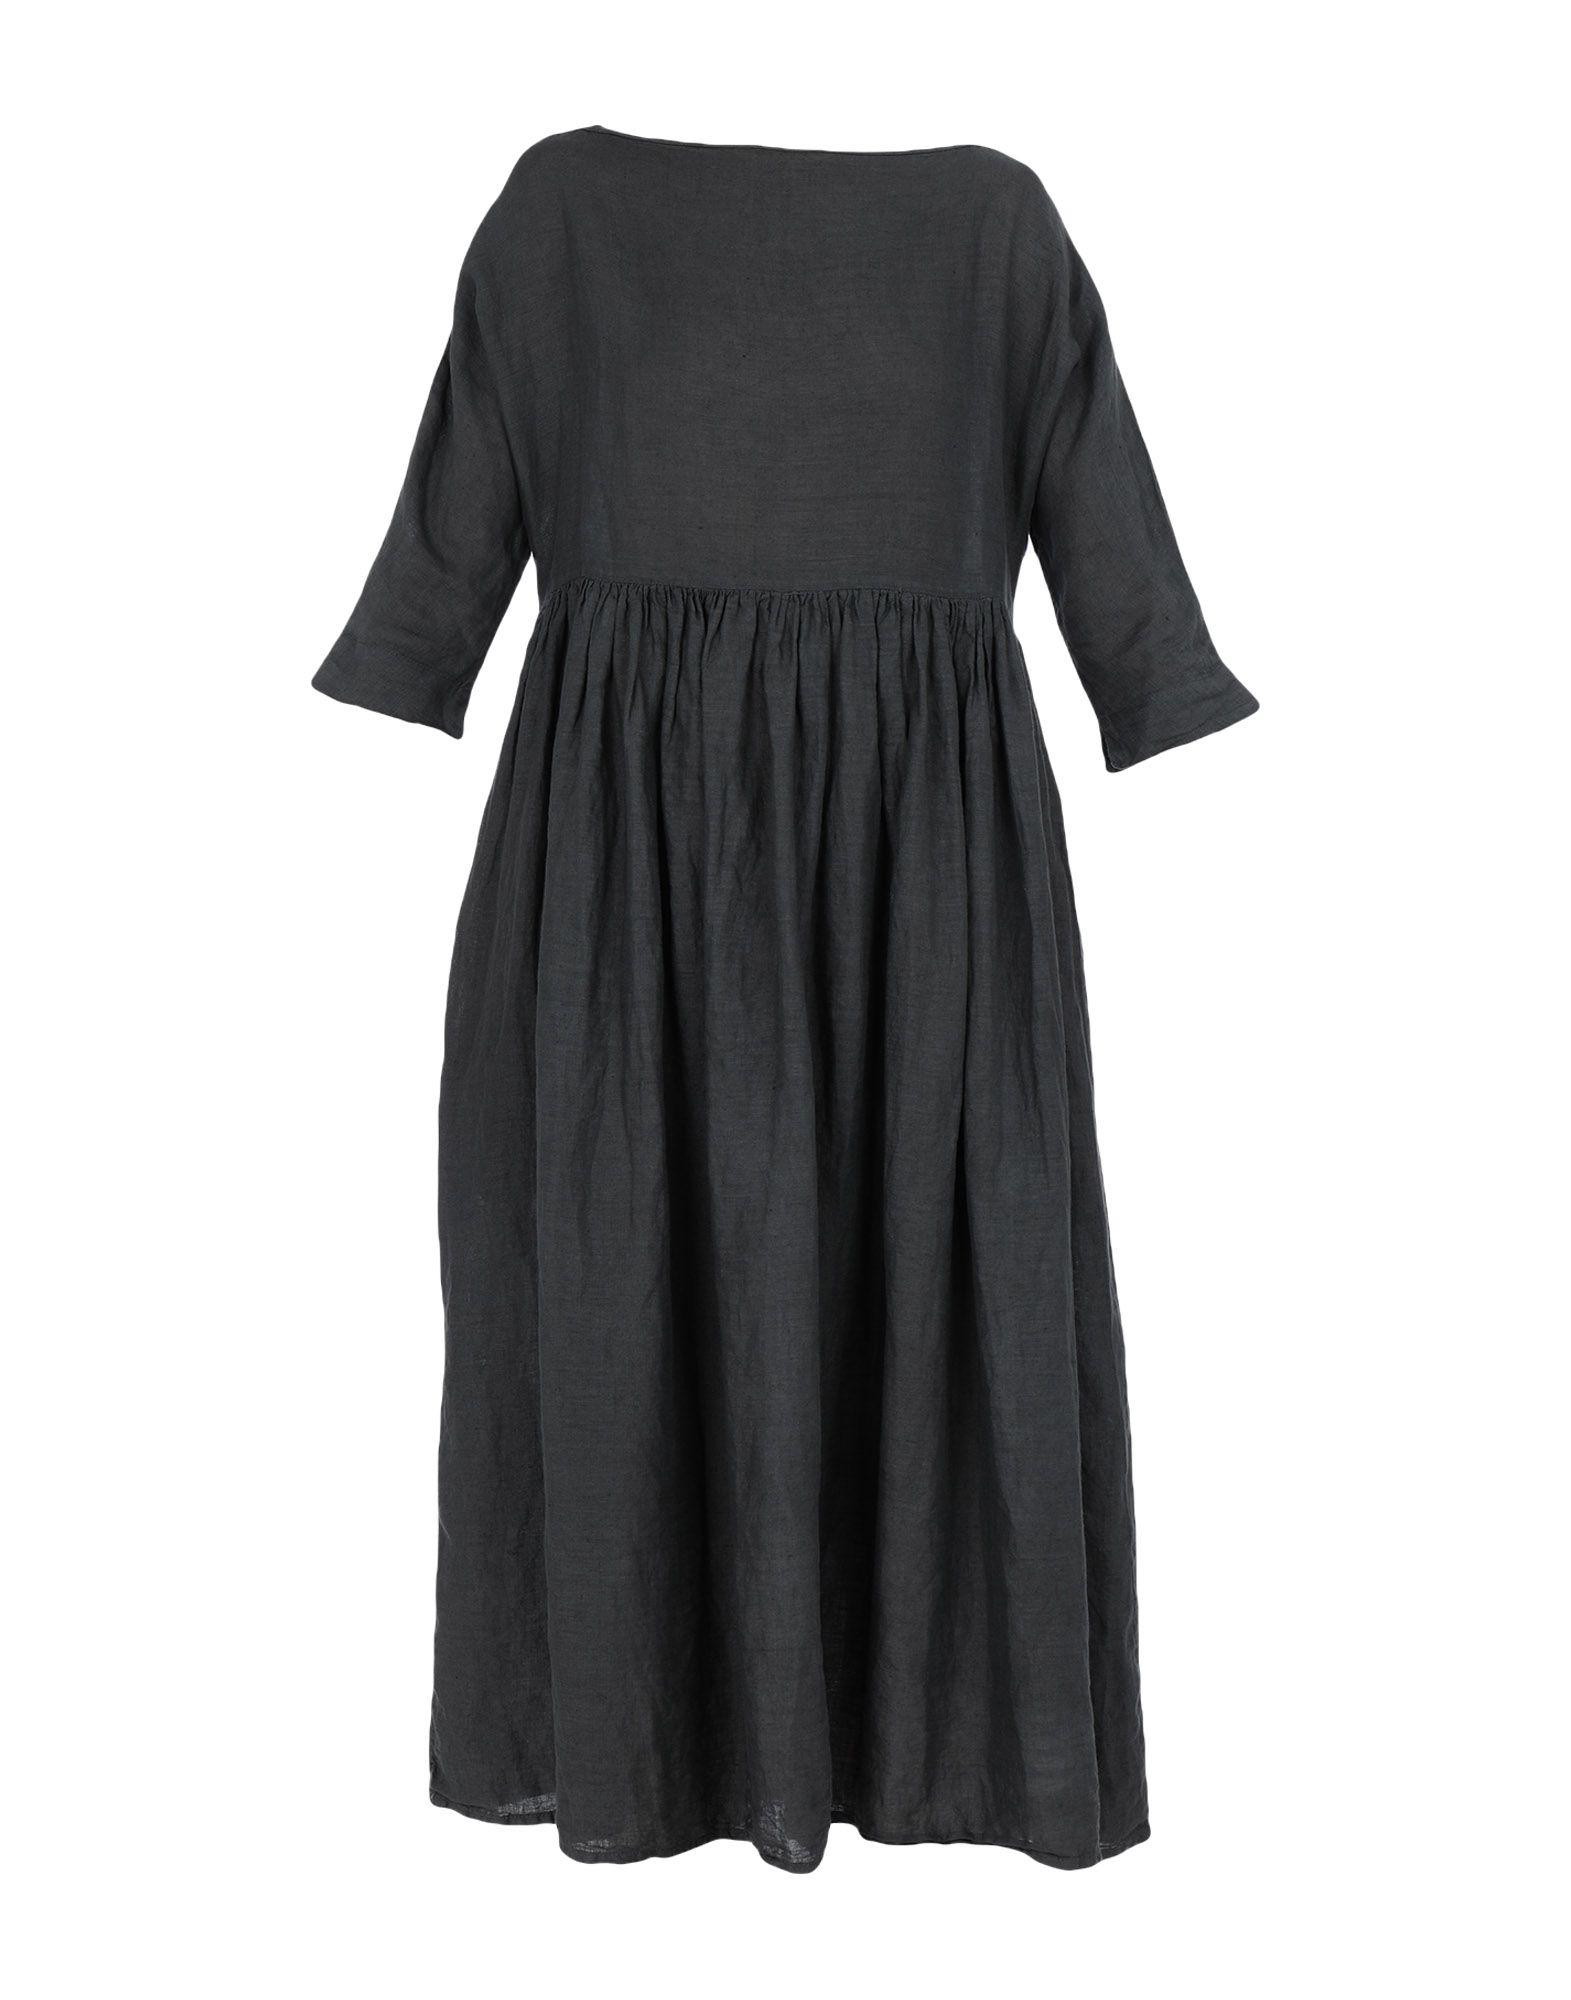 METTA MELBOURNE Платье длиной 3/4 2cellos melbourne